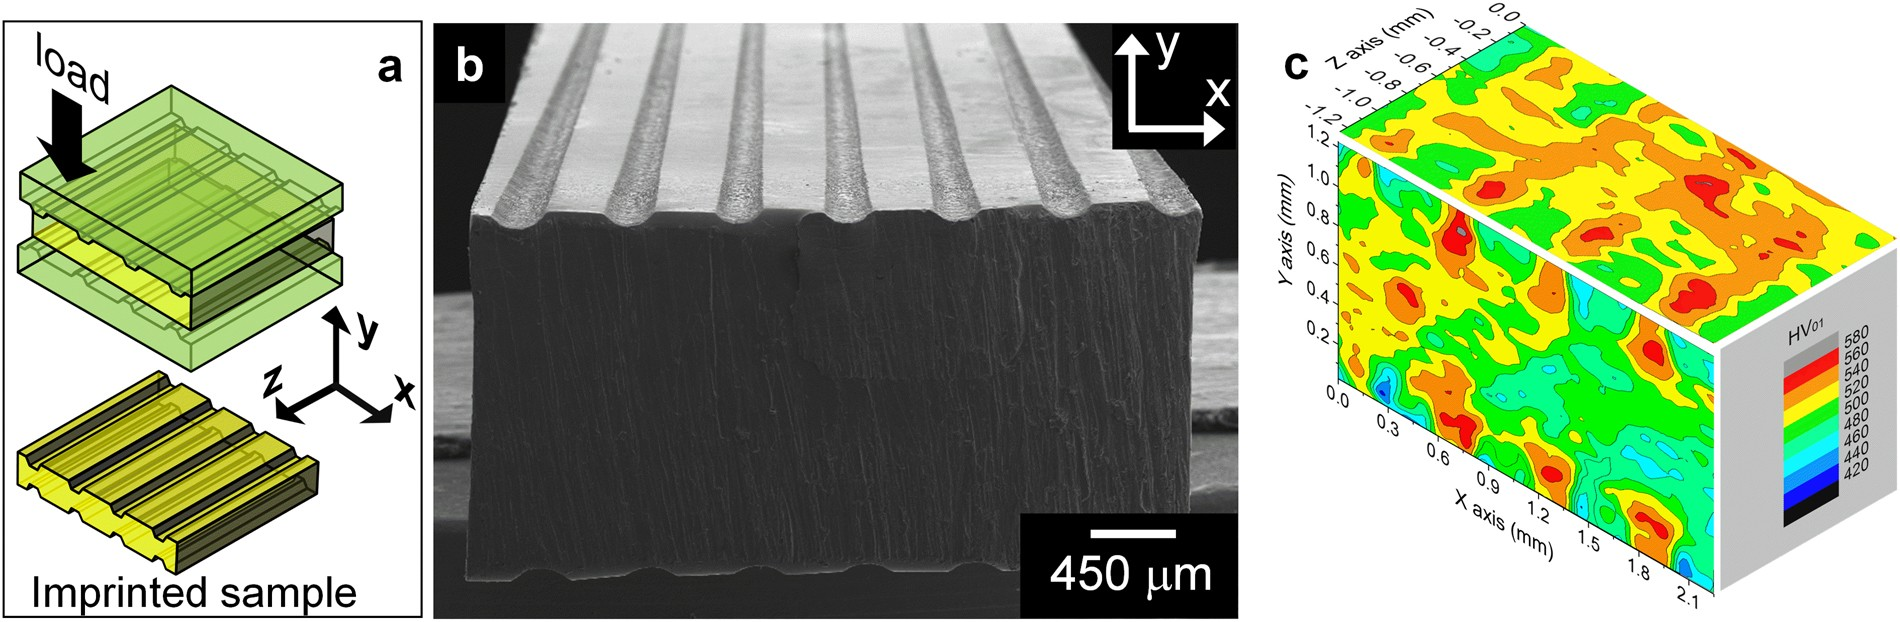 d0814a5ba777 Ductile bulk metallic glass by controlling structural heterogeneities